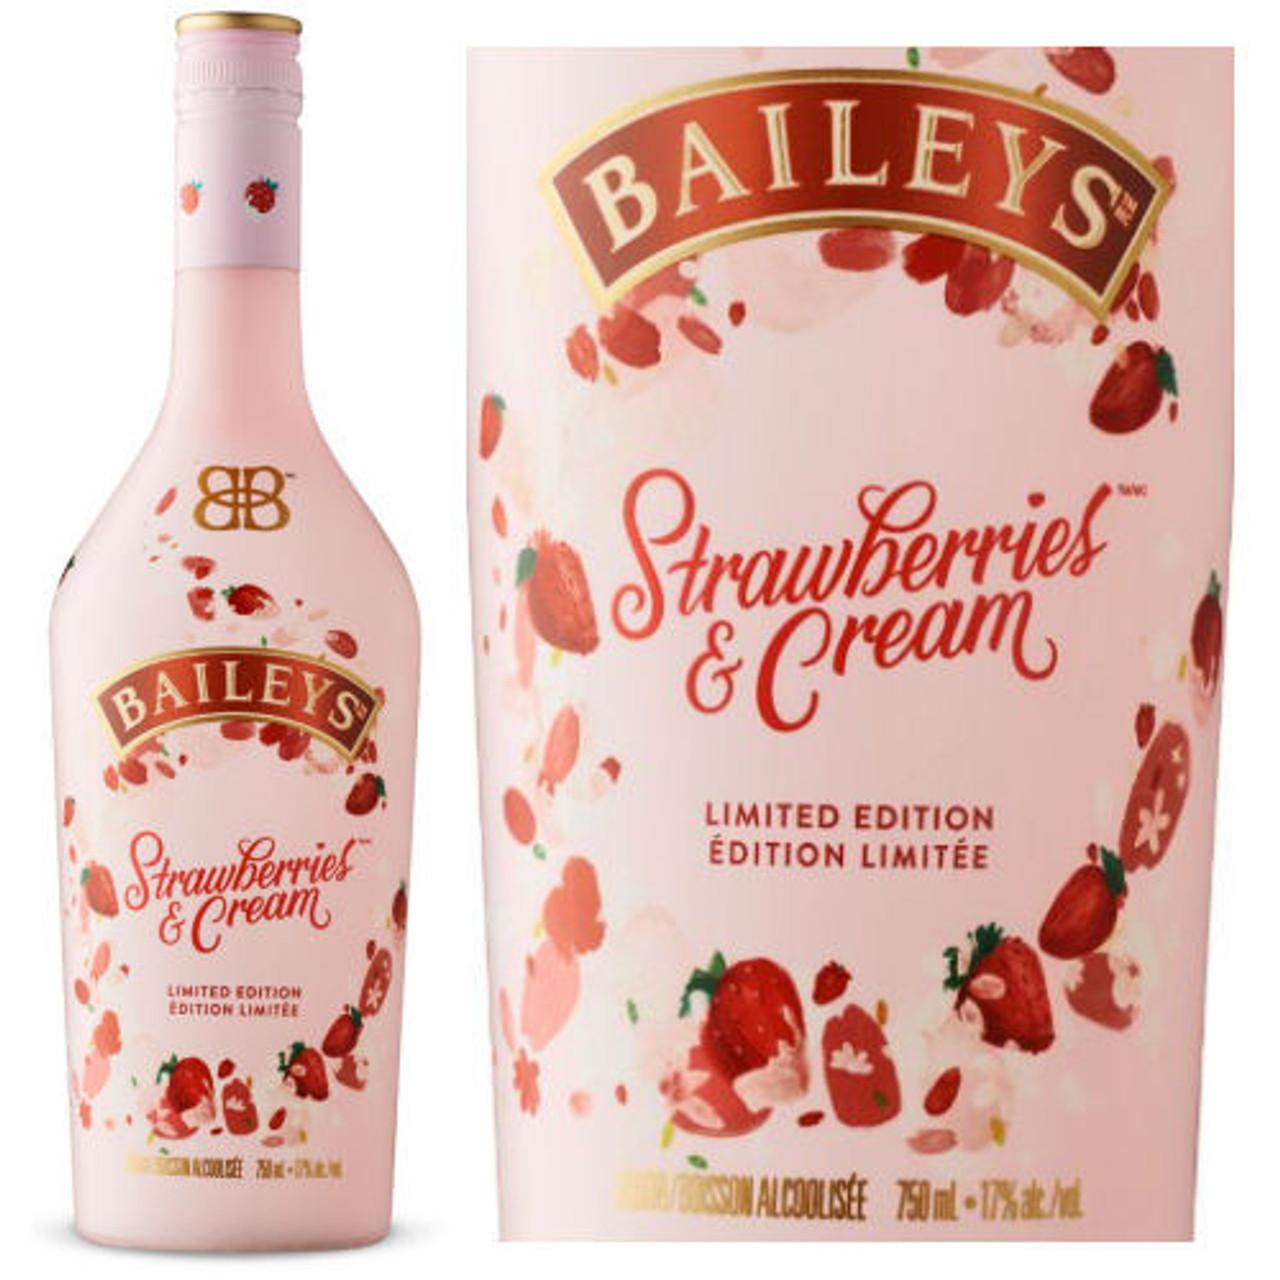 Baileys Irish Cream Strawberries & Cream Liqueur 750ml